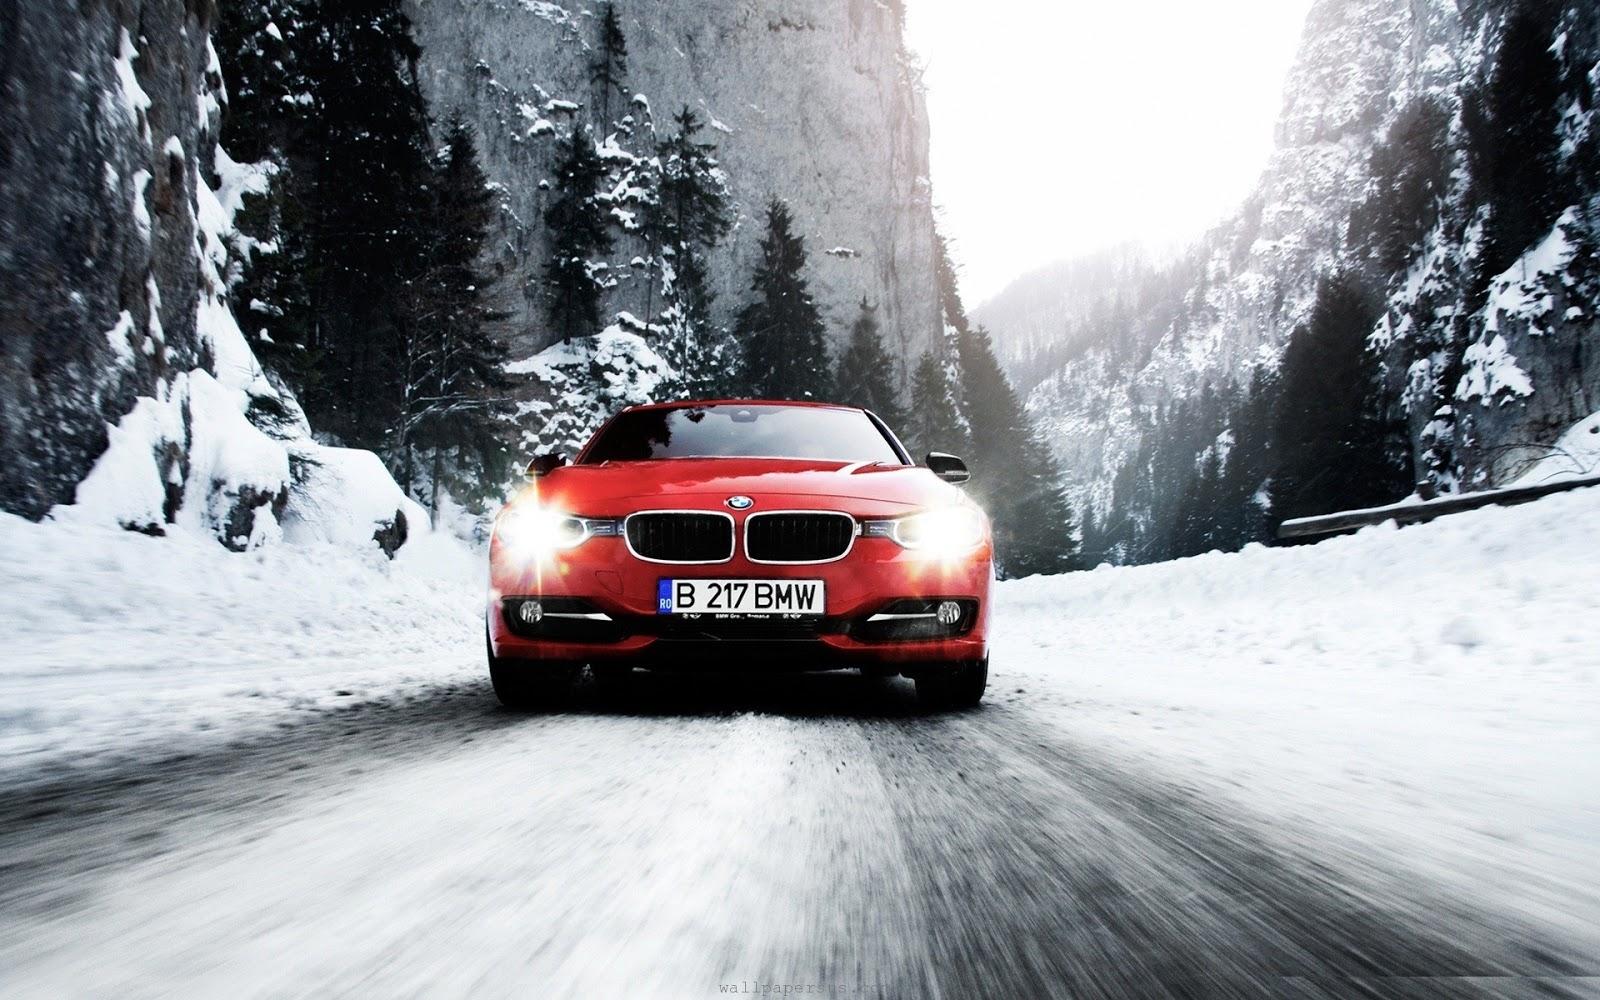 Winter Snow HD Wallpapers – wallpaper202